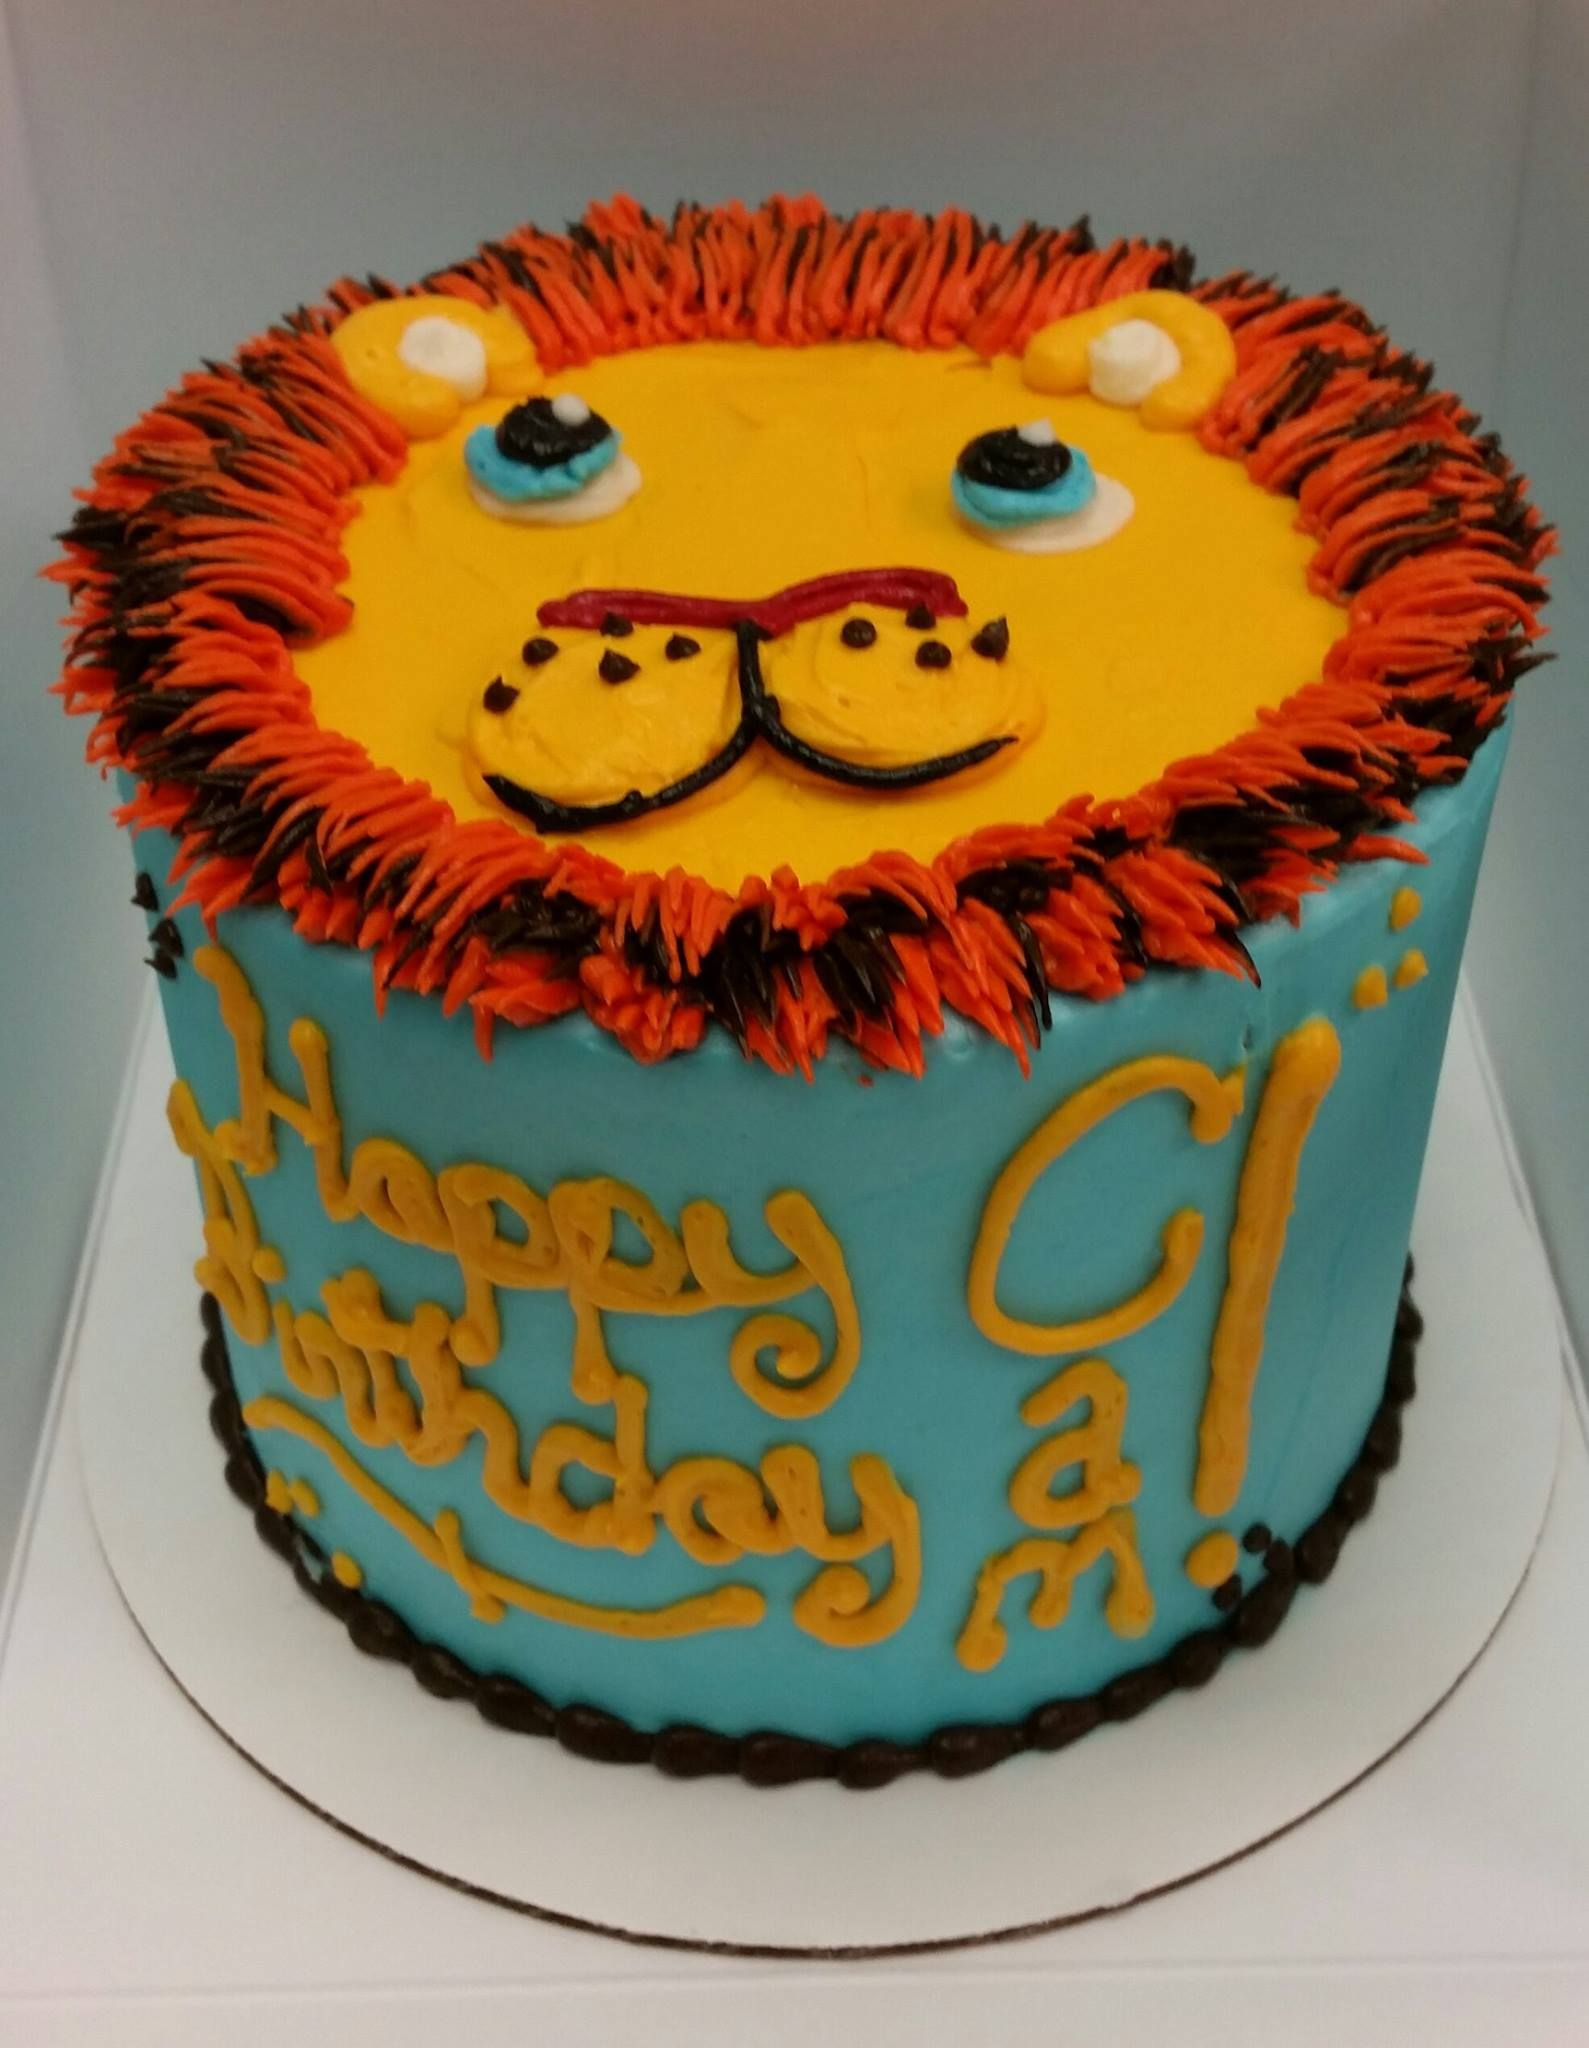 Pin by Megan S on Celebrations Birthdays Cake, Desserts